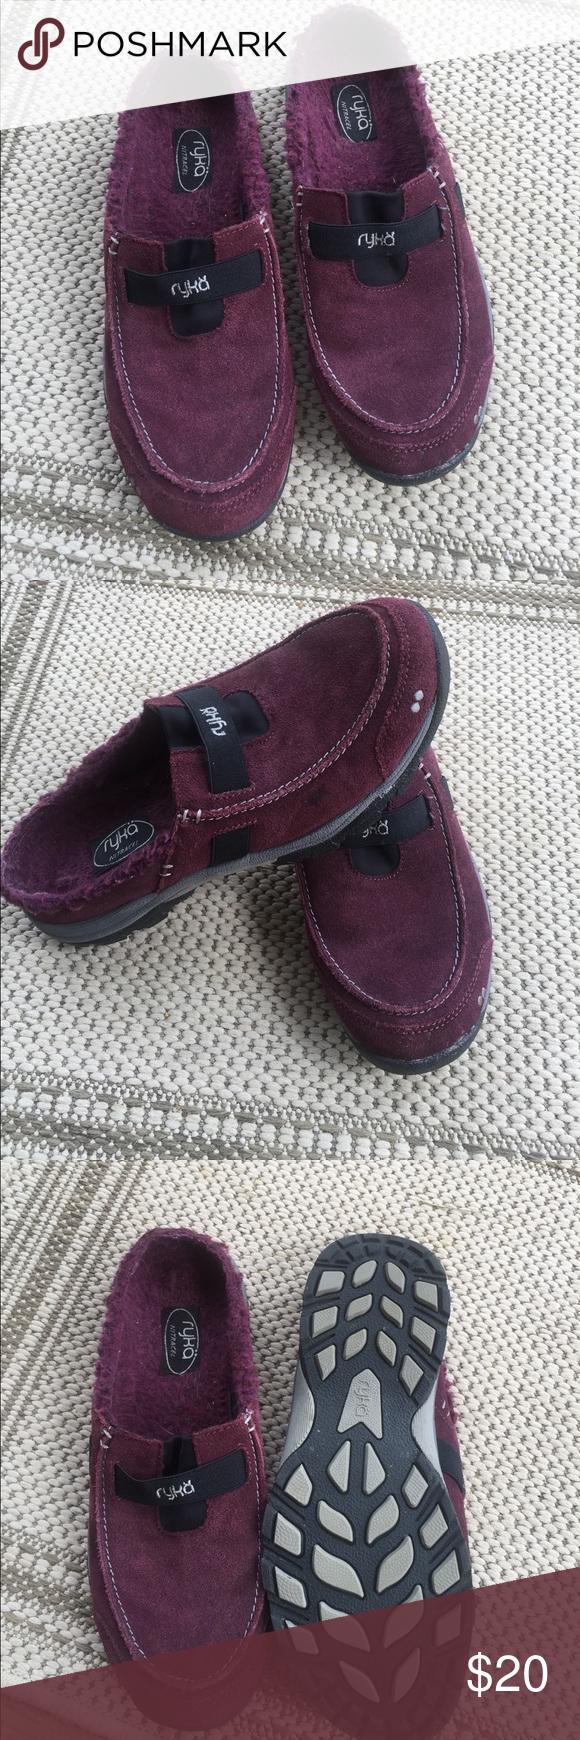 Ryka Slip Ons Size 7 1/2 $20 Ryka Burgundy Suede Slip Ons Size 7 1/2 $20 Ryka Shoes Mules & Clogs